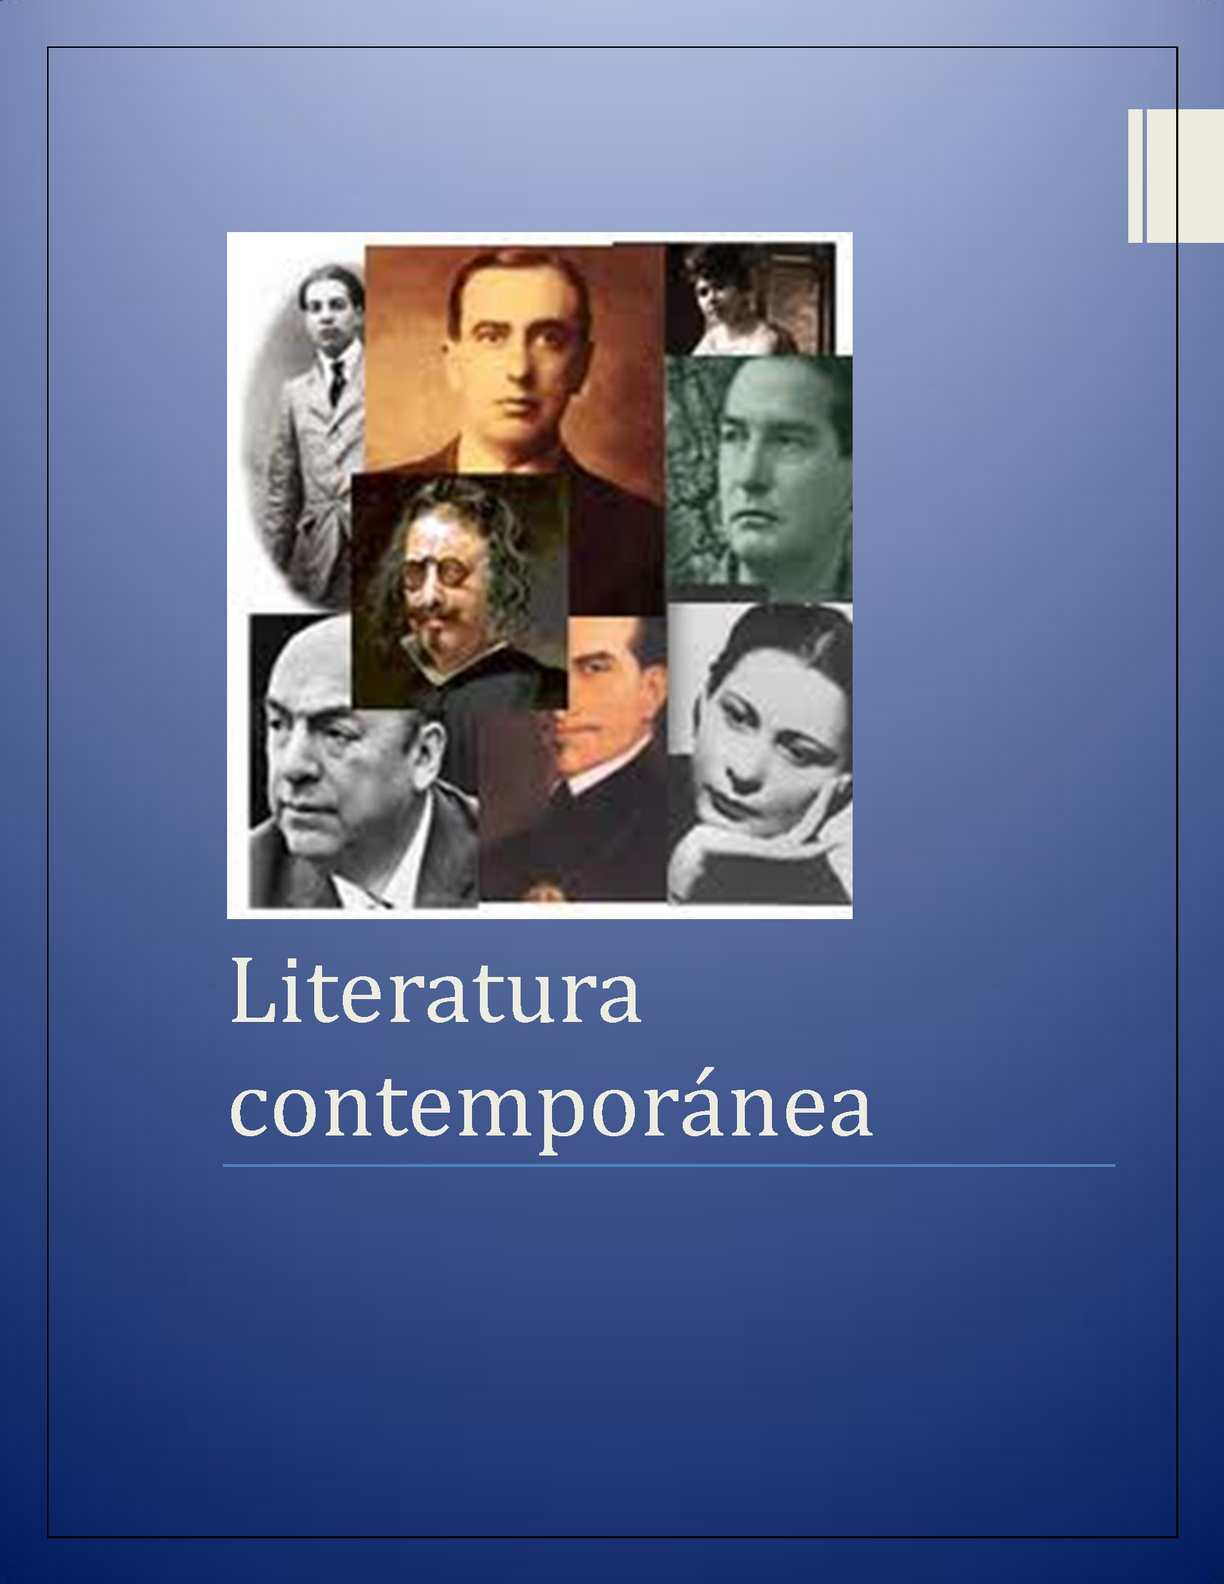 Calam o literatura contemporanea for Epoca contemporanea definicion